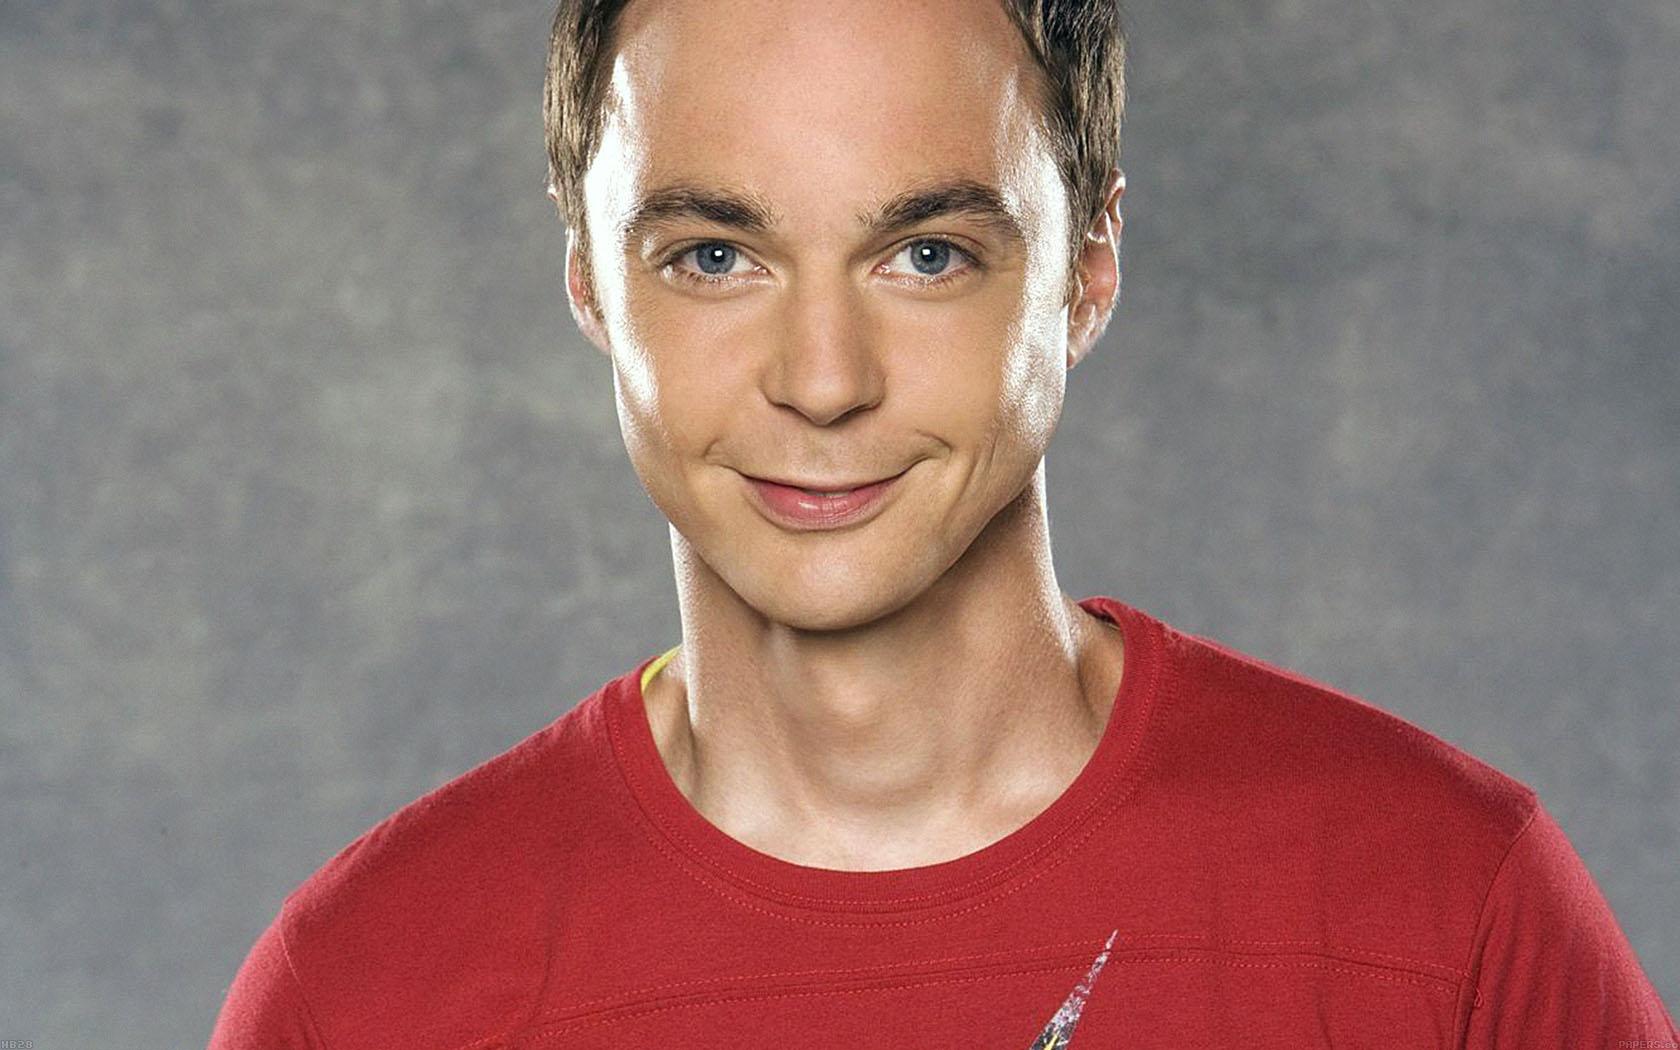 Hb28 Wallpaper Sheldon Cooper Big Bang Theory Bazinga